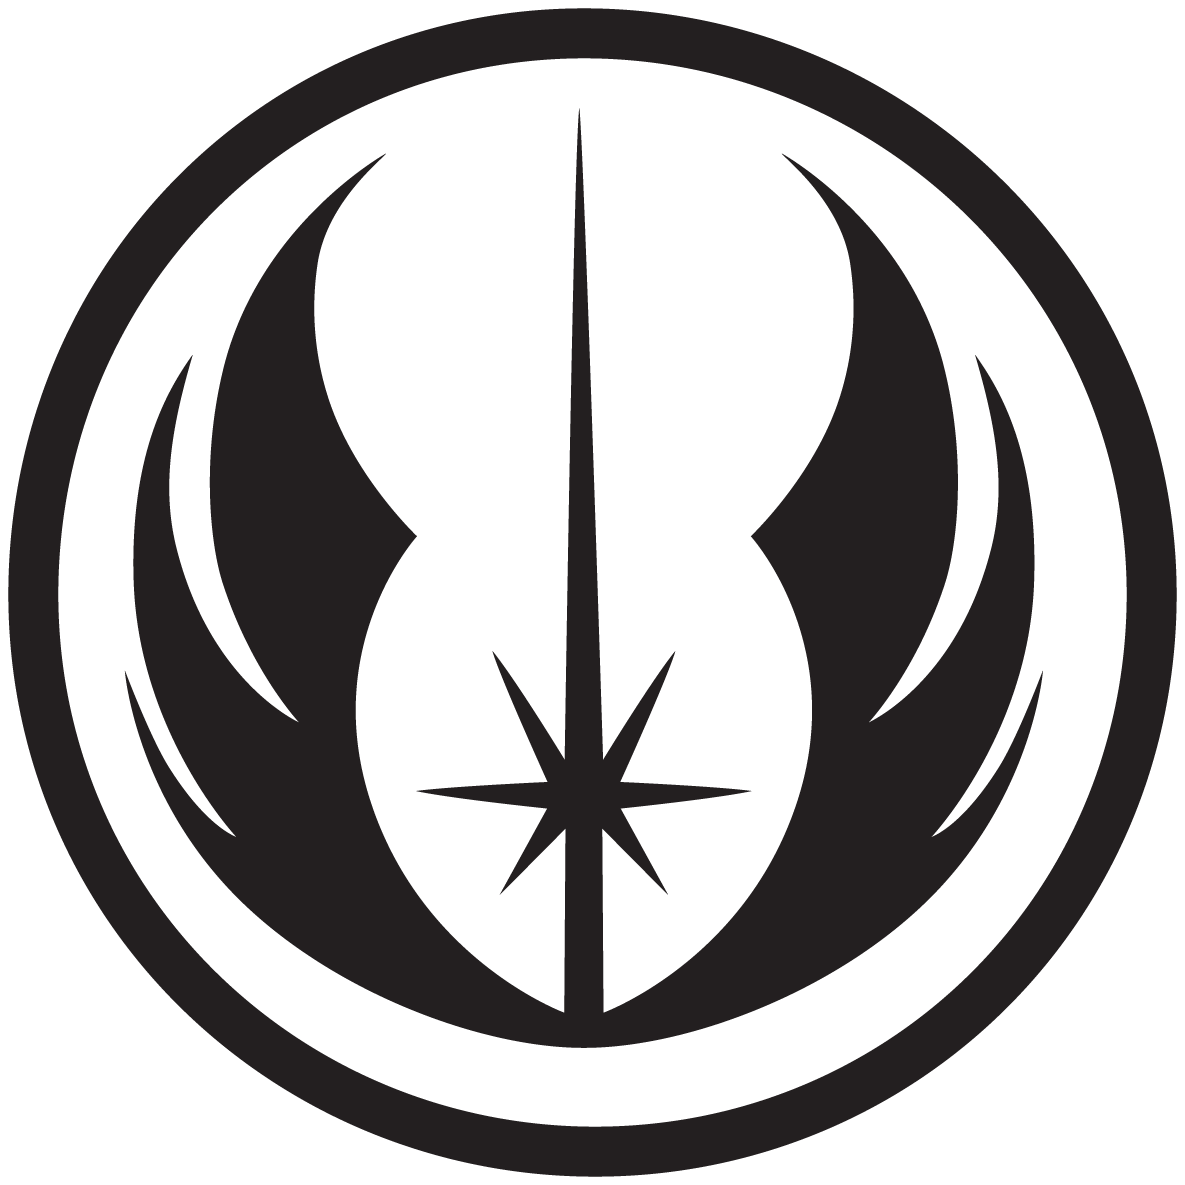 Jedi Order Symbol Cellphone Wallpaper by swmand4 1185x1185